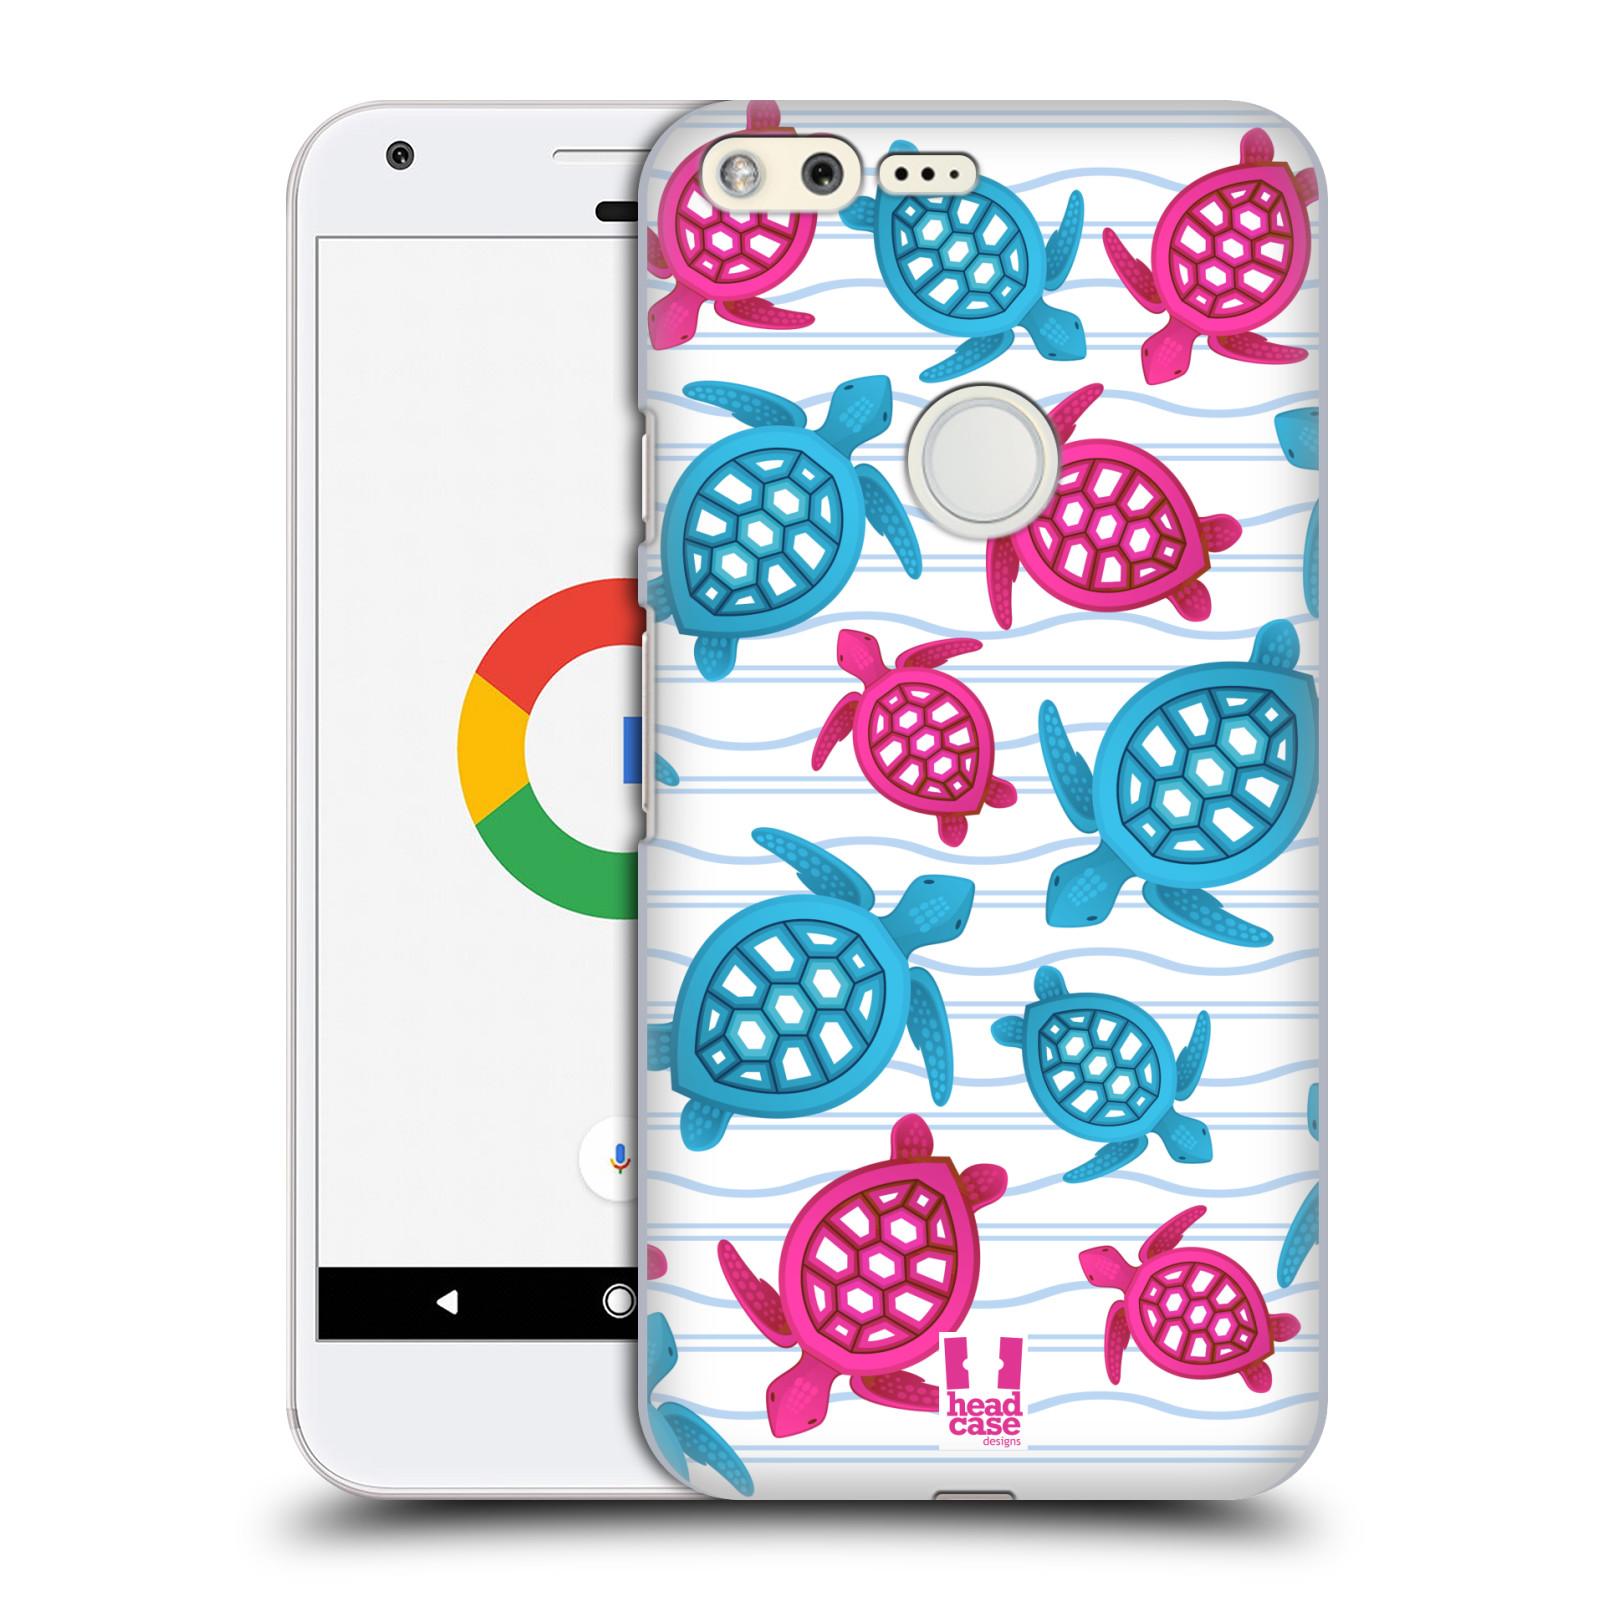 HEAD CASE plastový obal na mobil GOOGLE Pixel vzor mořský živočich želva modrá a růžová